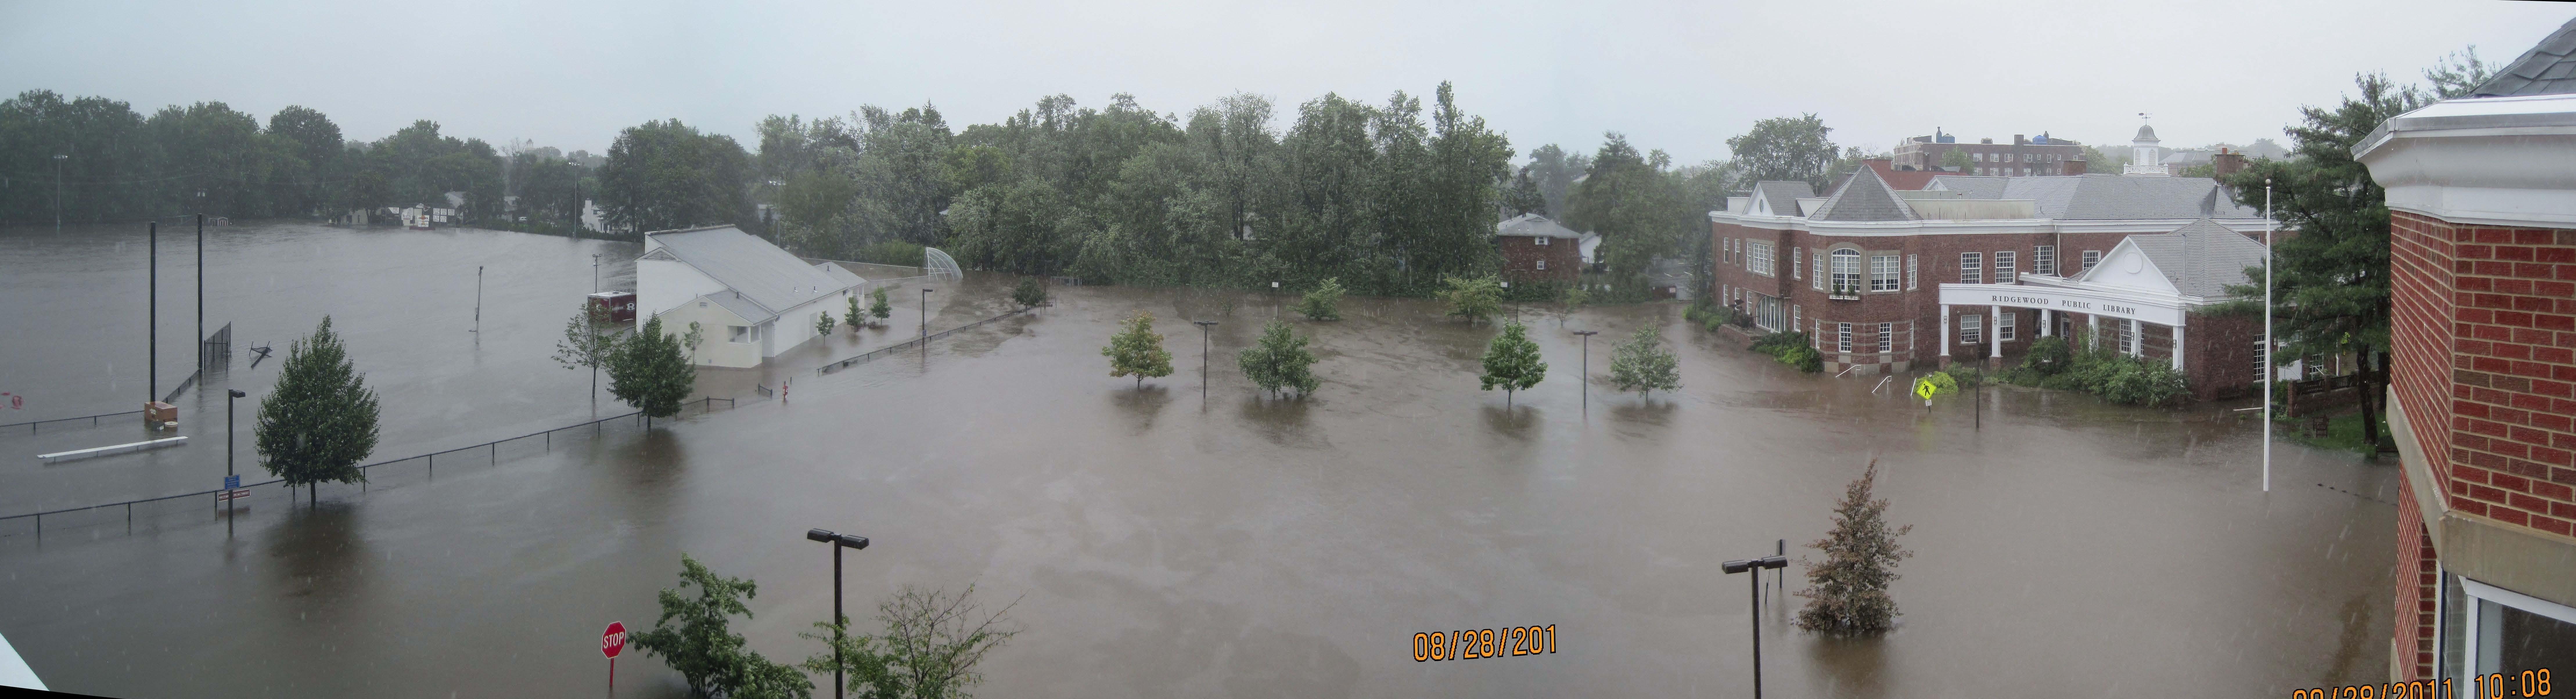 Ridgewood New Jersey Map.Village Of Ridgewood Floodplain Management